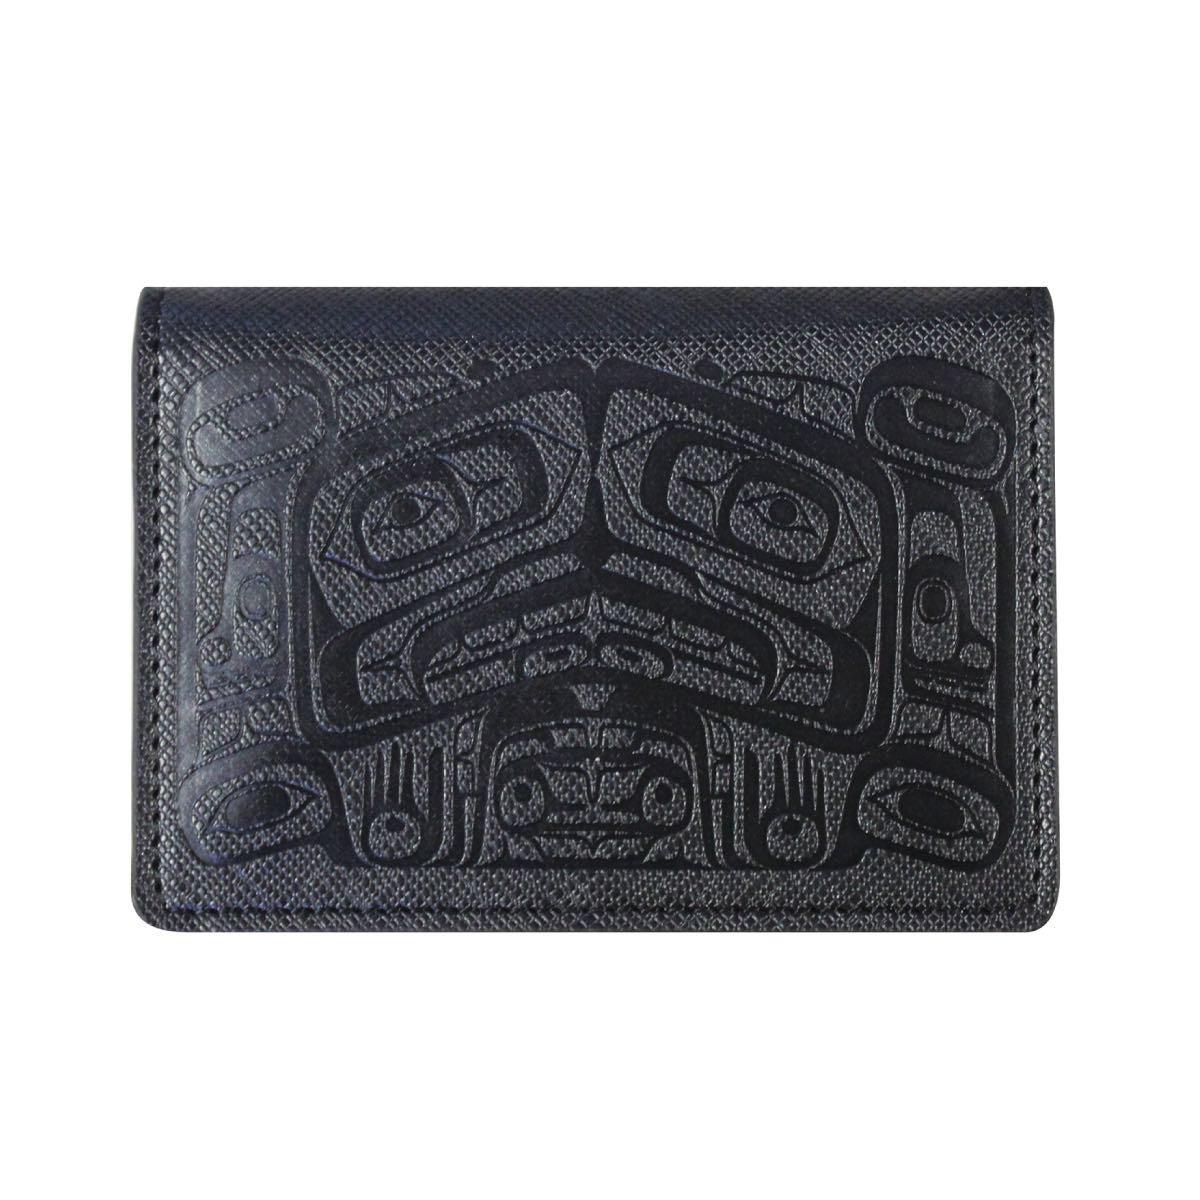 Card Wallet-Raven Box by Allan Weir-1